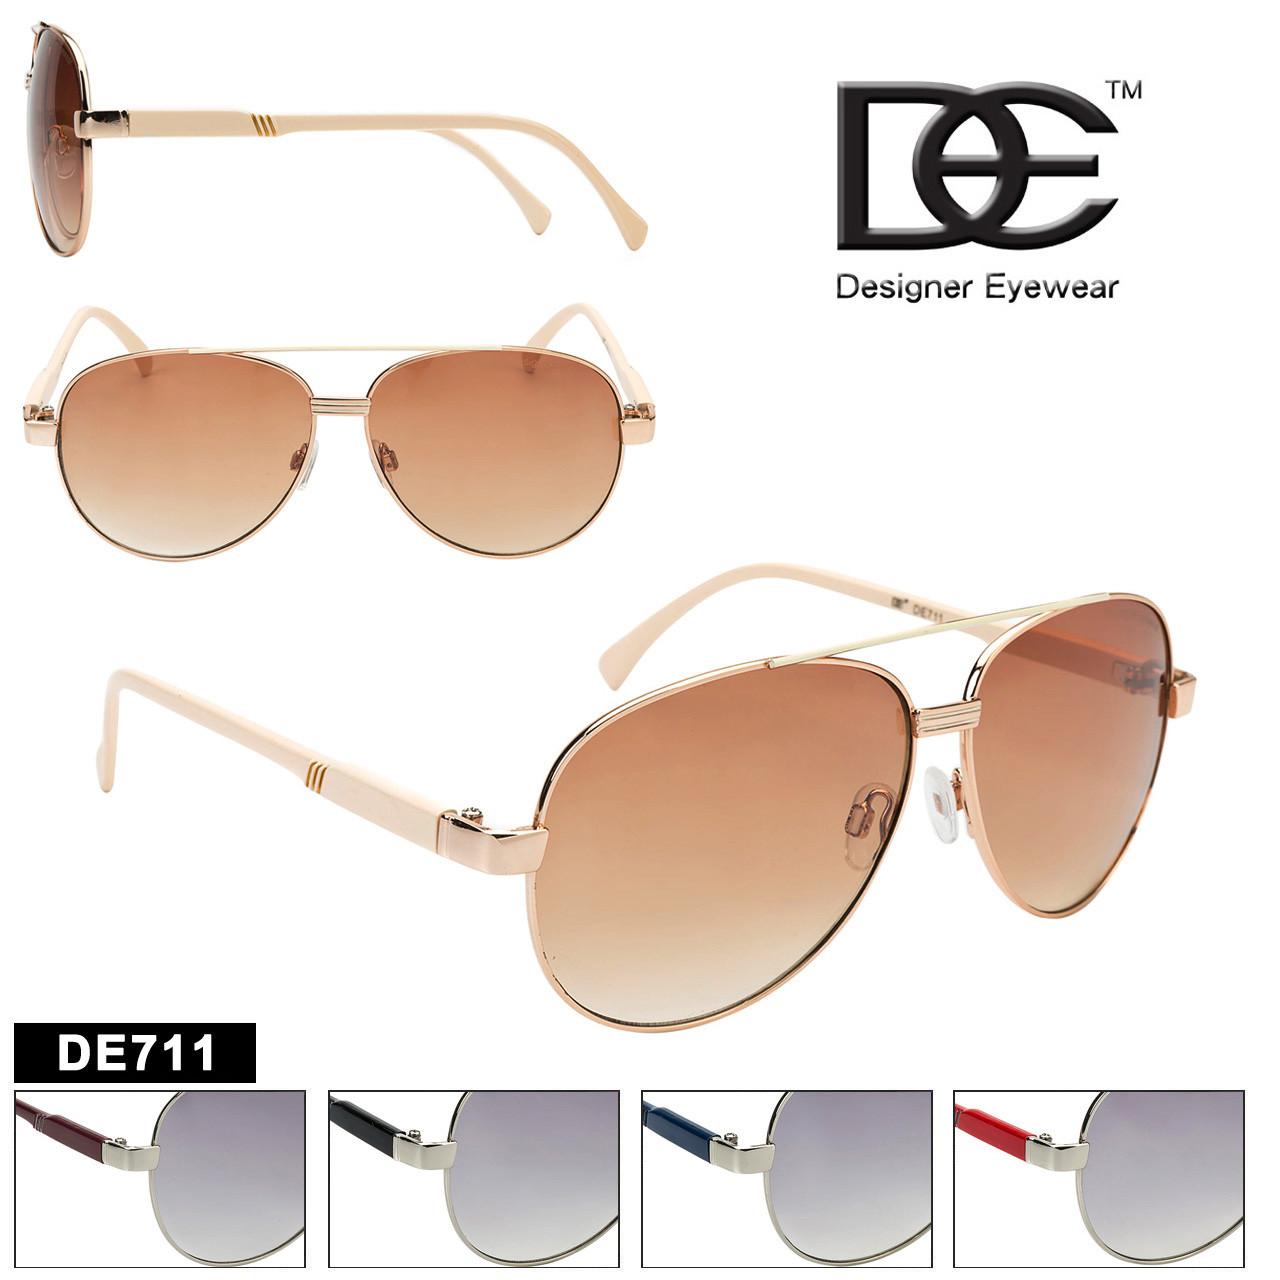 DE™ Aviator Sunglasses by the Dozen - Style #DE711